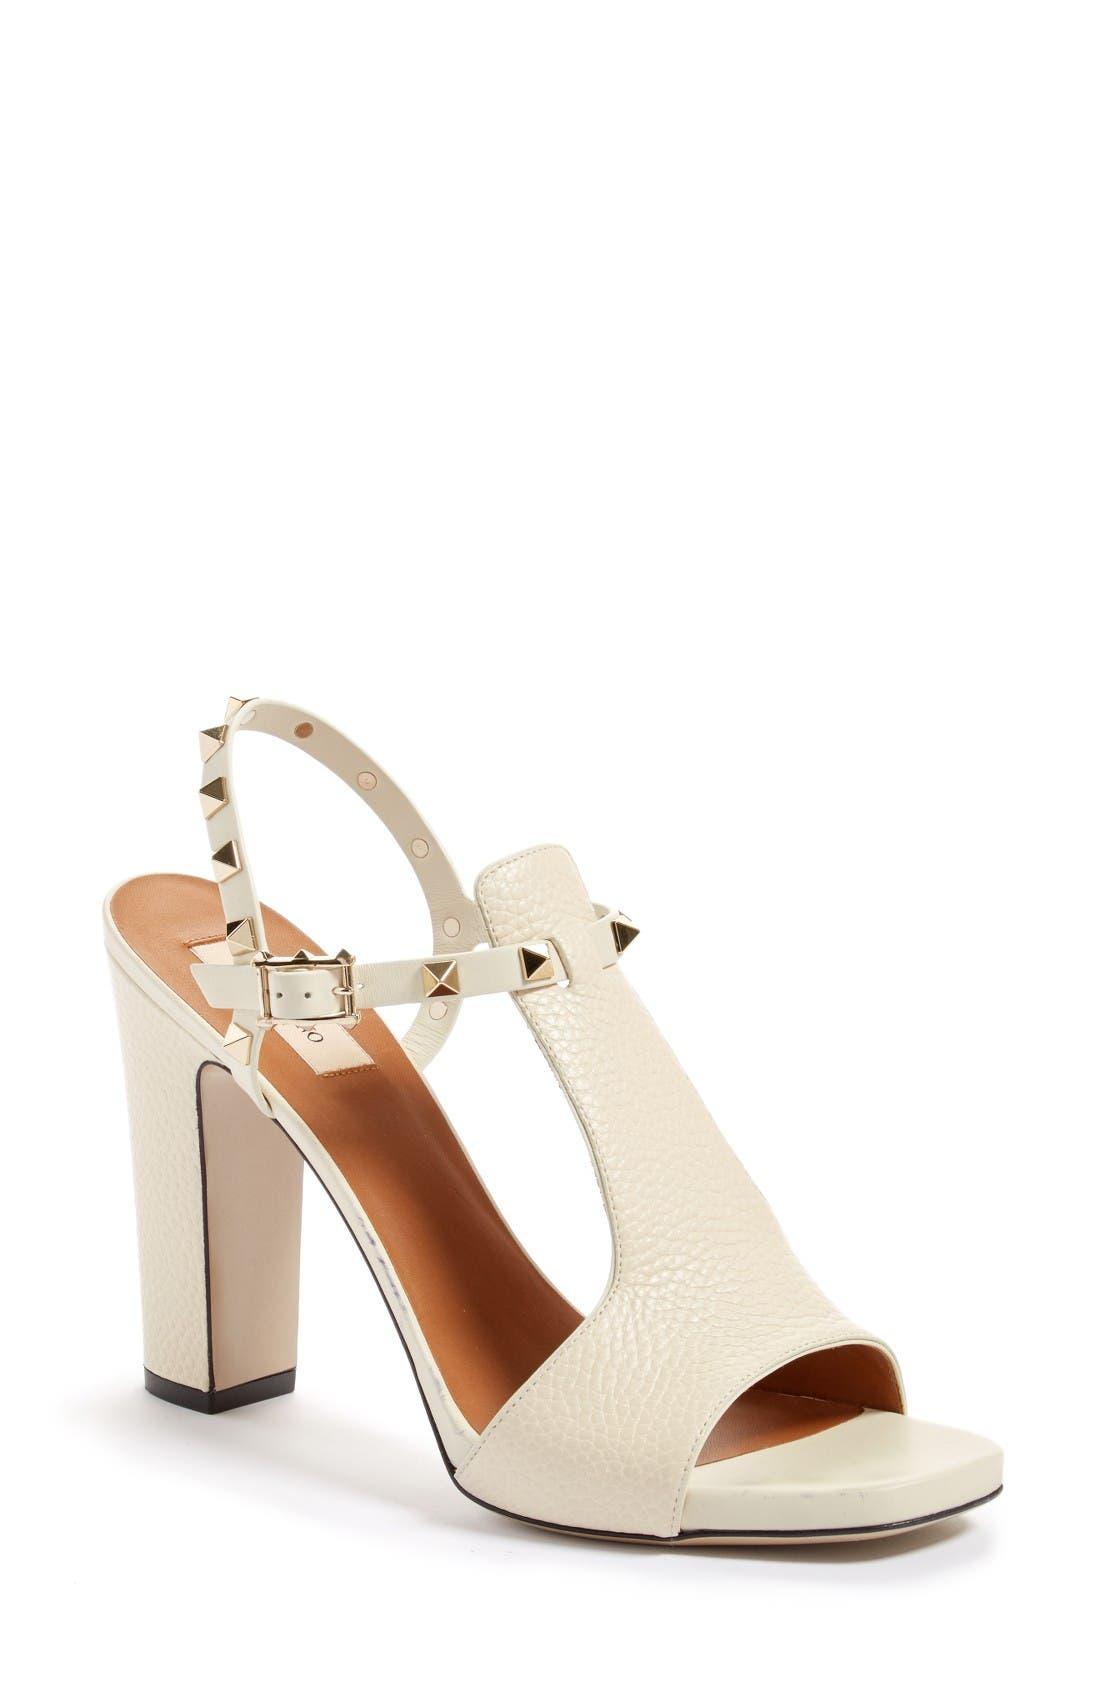 VALENTINO GARAVANI Rockstud T-Strap Sandal (Women)